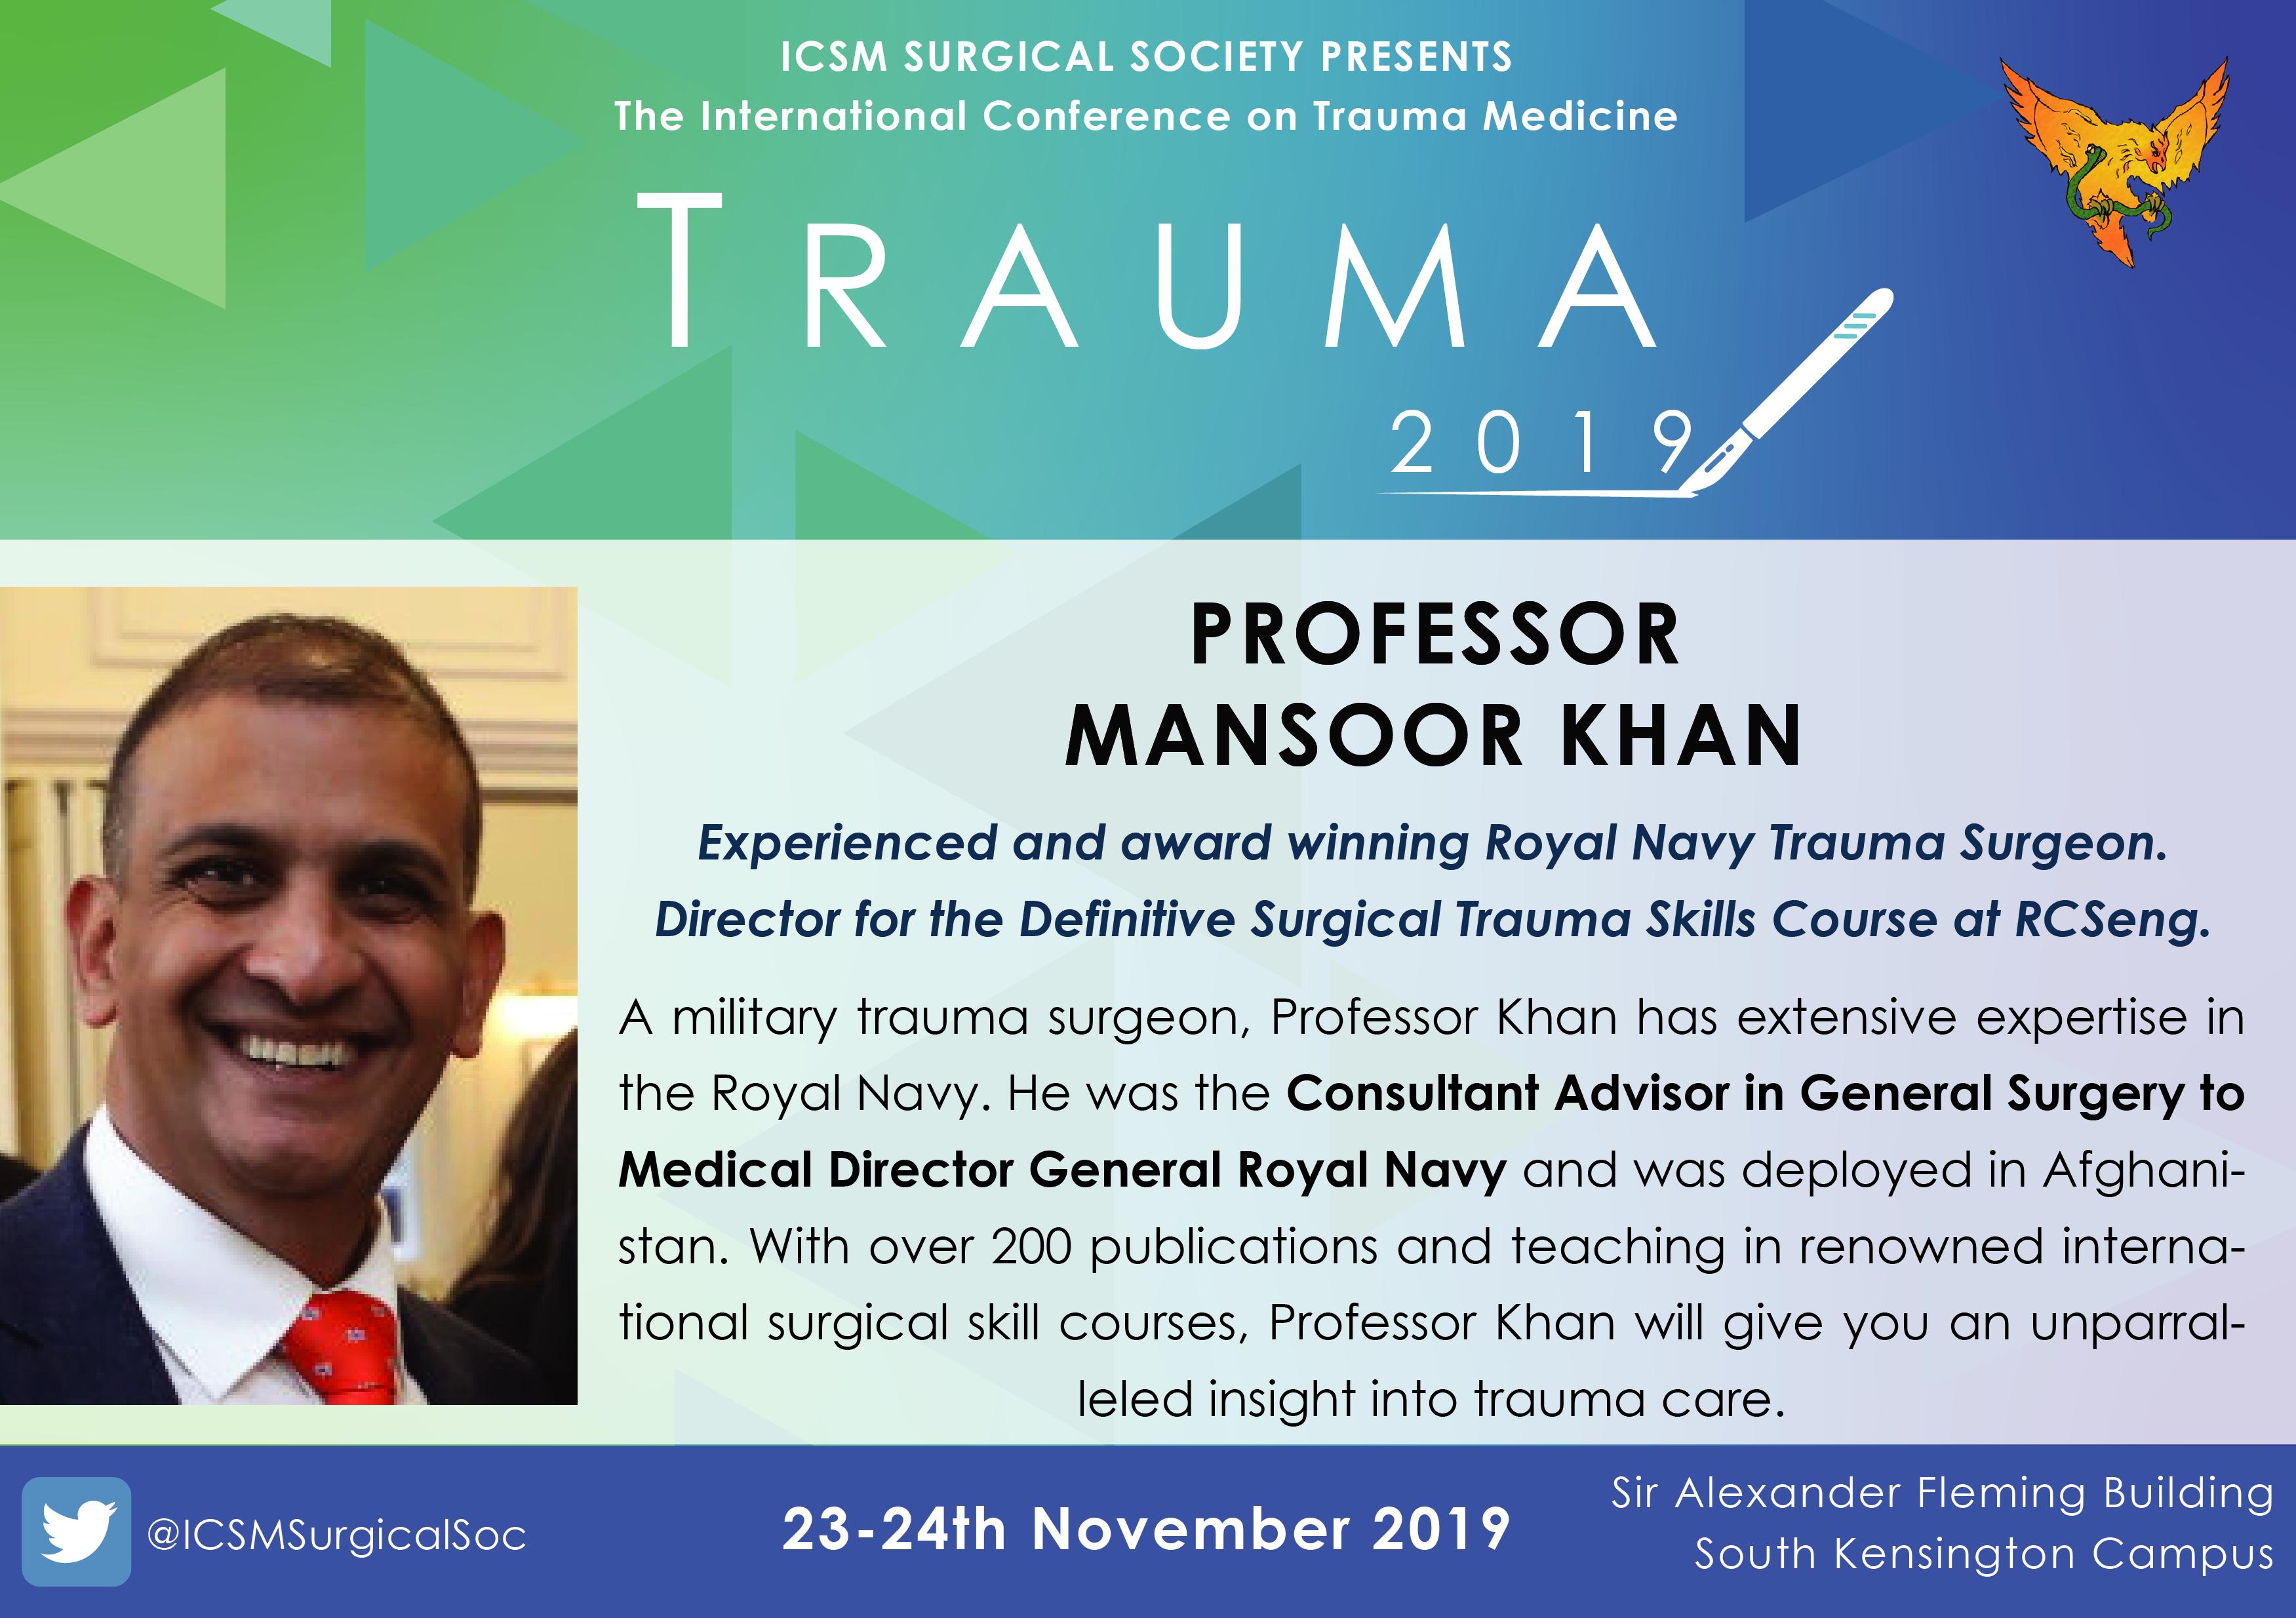 Prof Khan Landscape